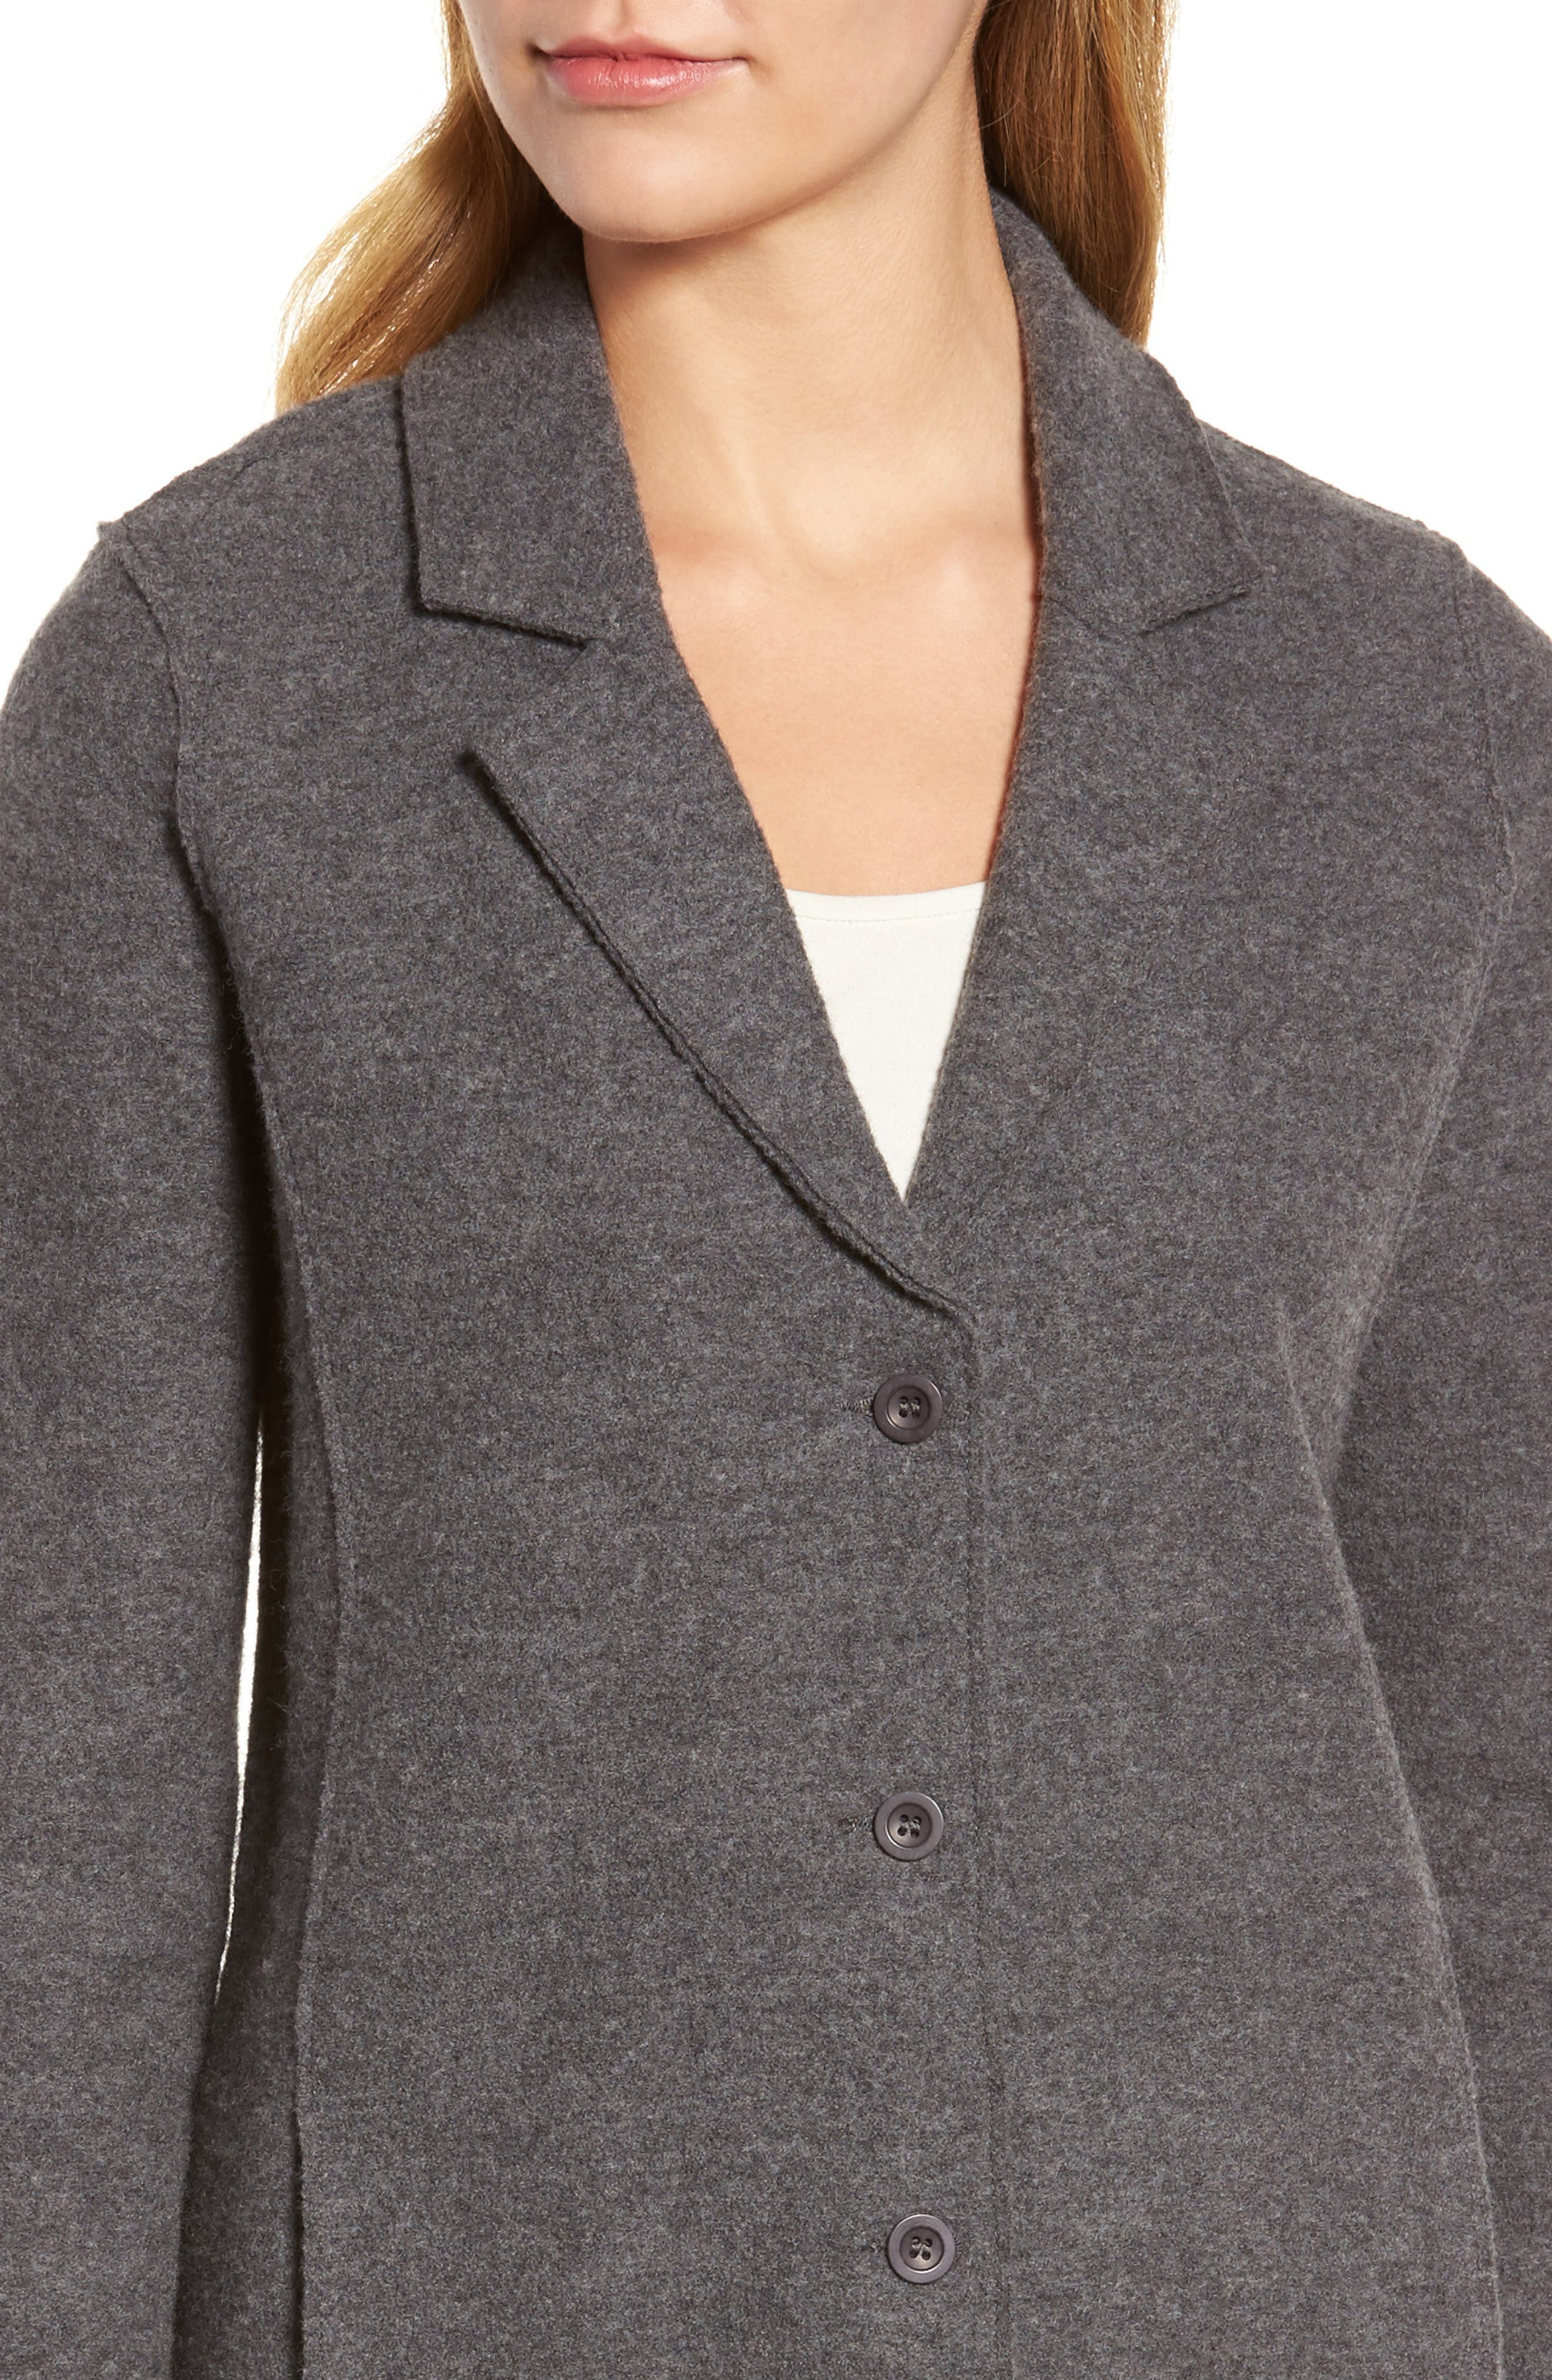 Notch Collar Merino Wool Jacket,                             Alternate thumbnail 4, color,                             030